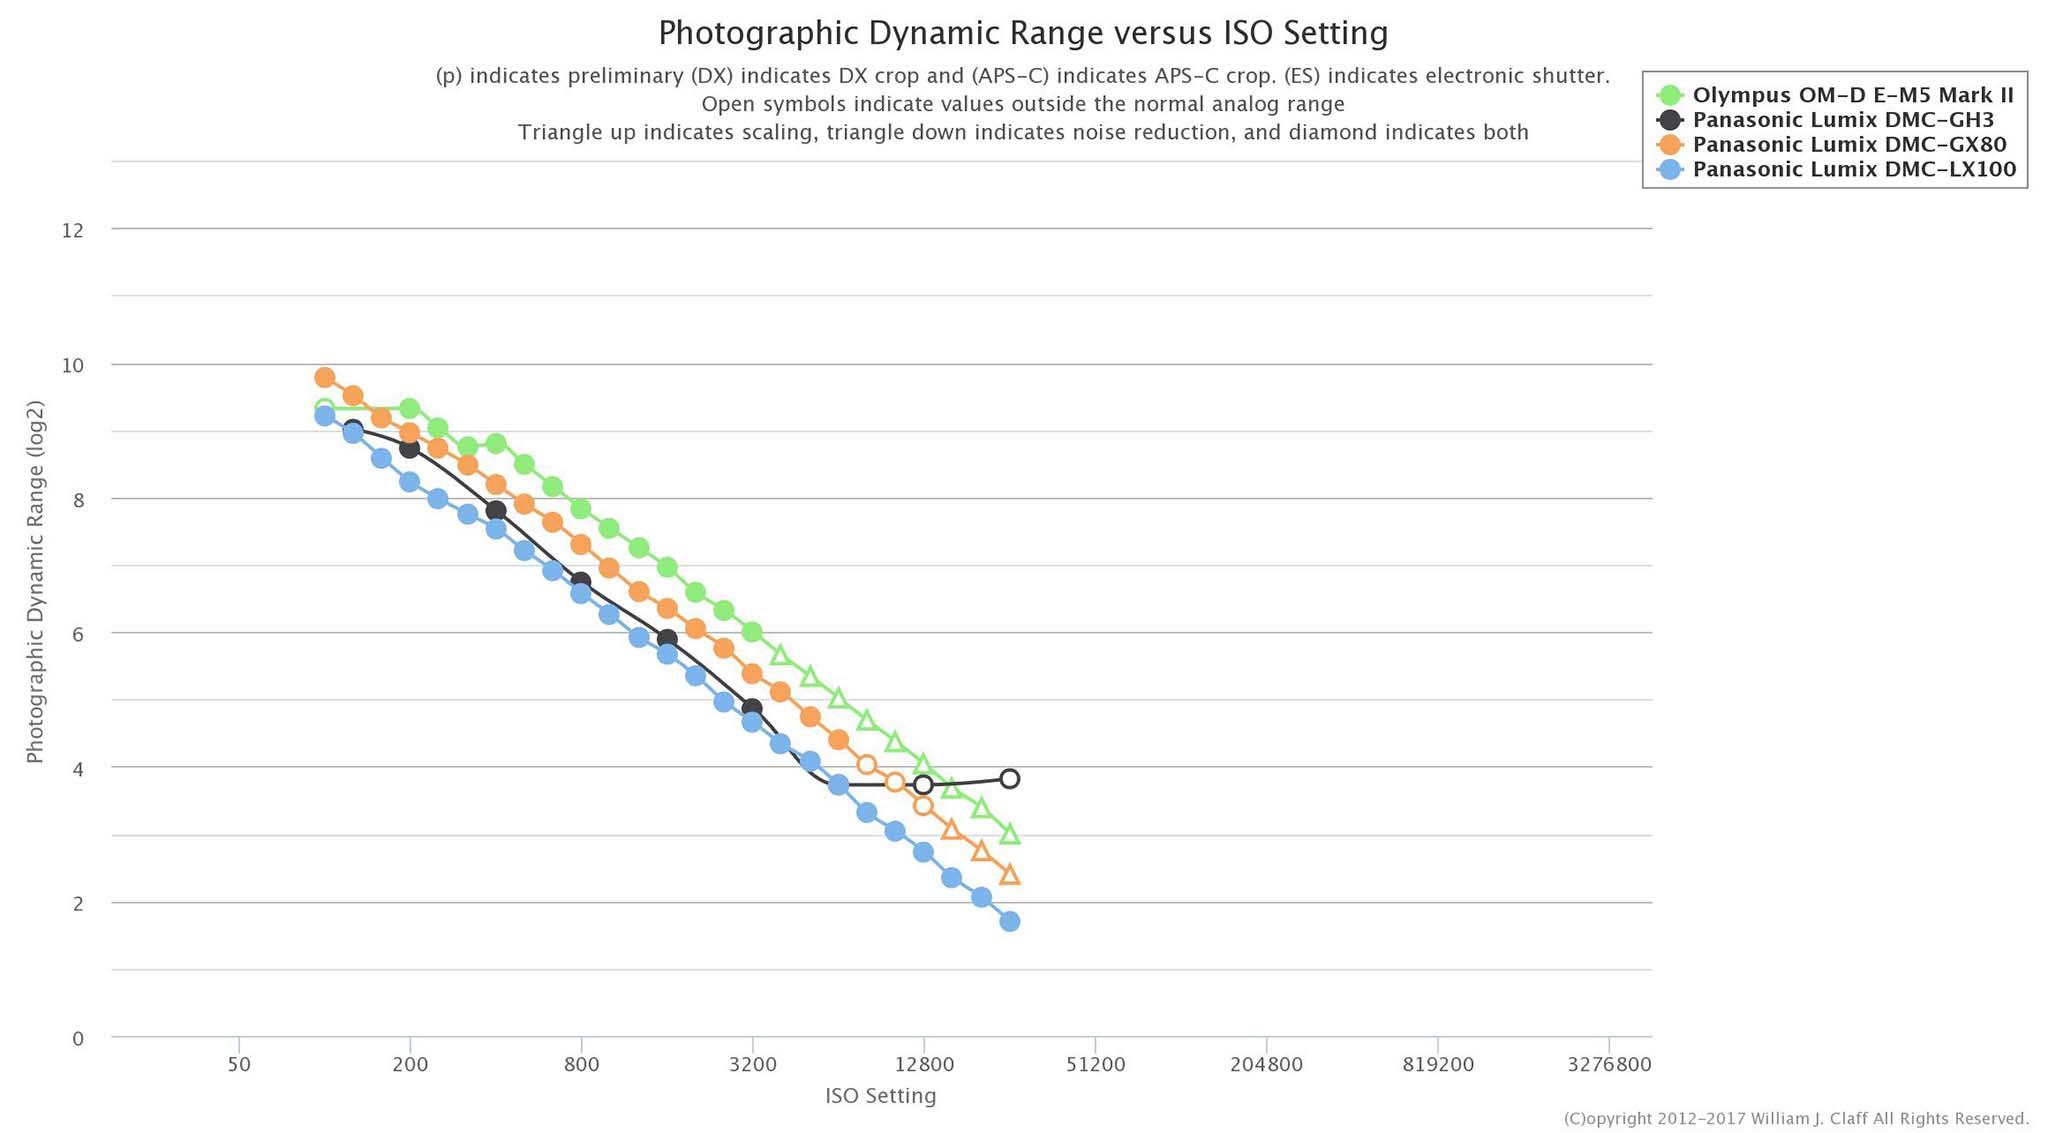 Photons To Photos: Panasonic LX100 Dynamic Range Results - 43addict